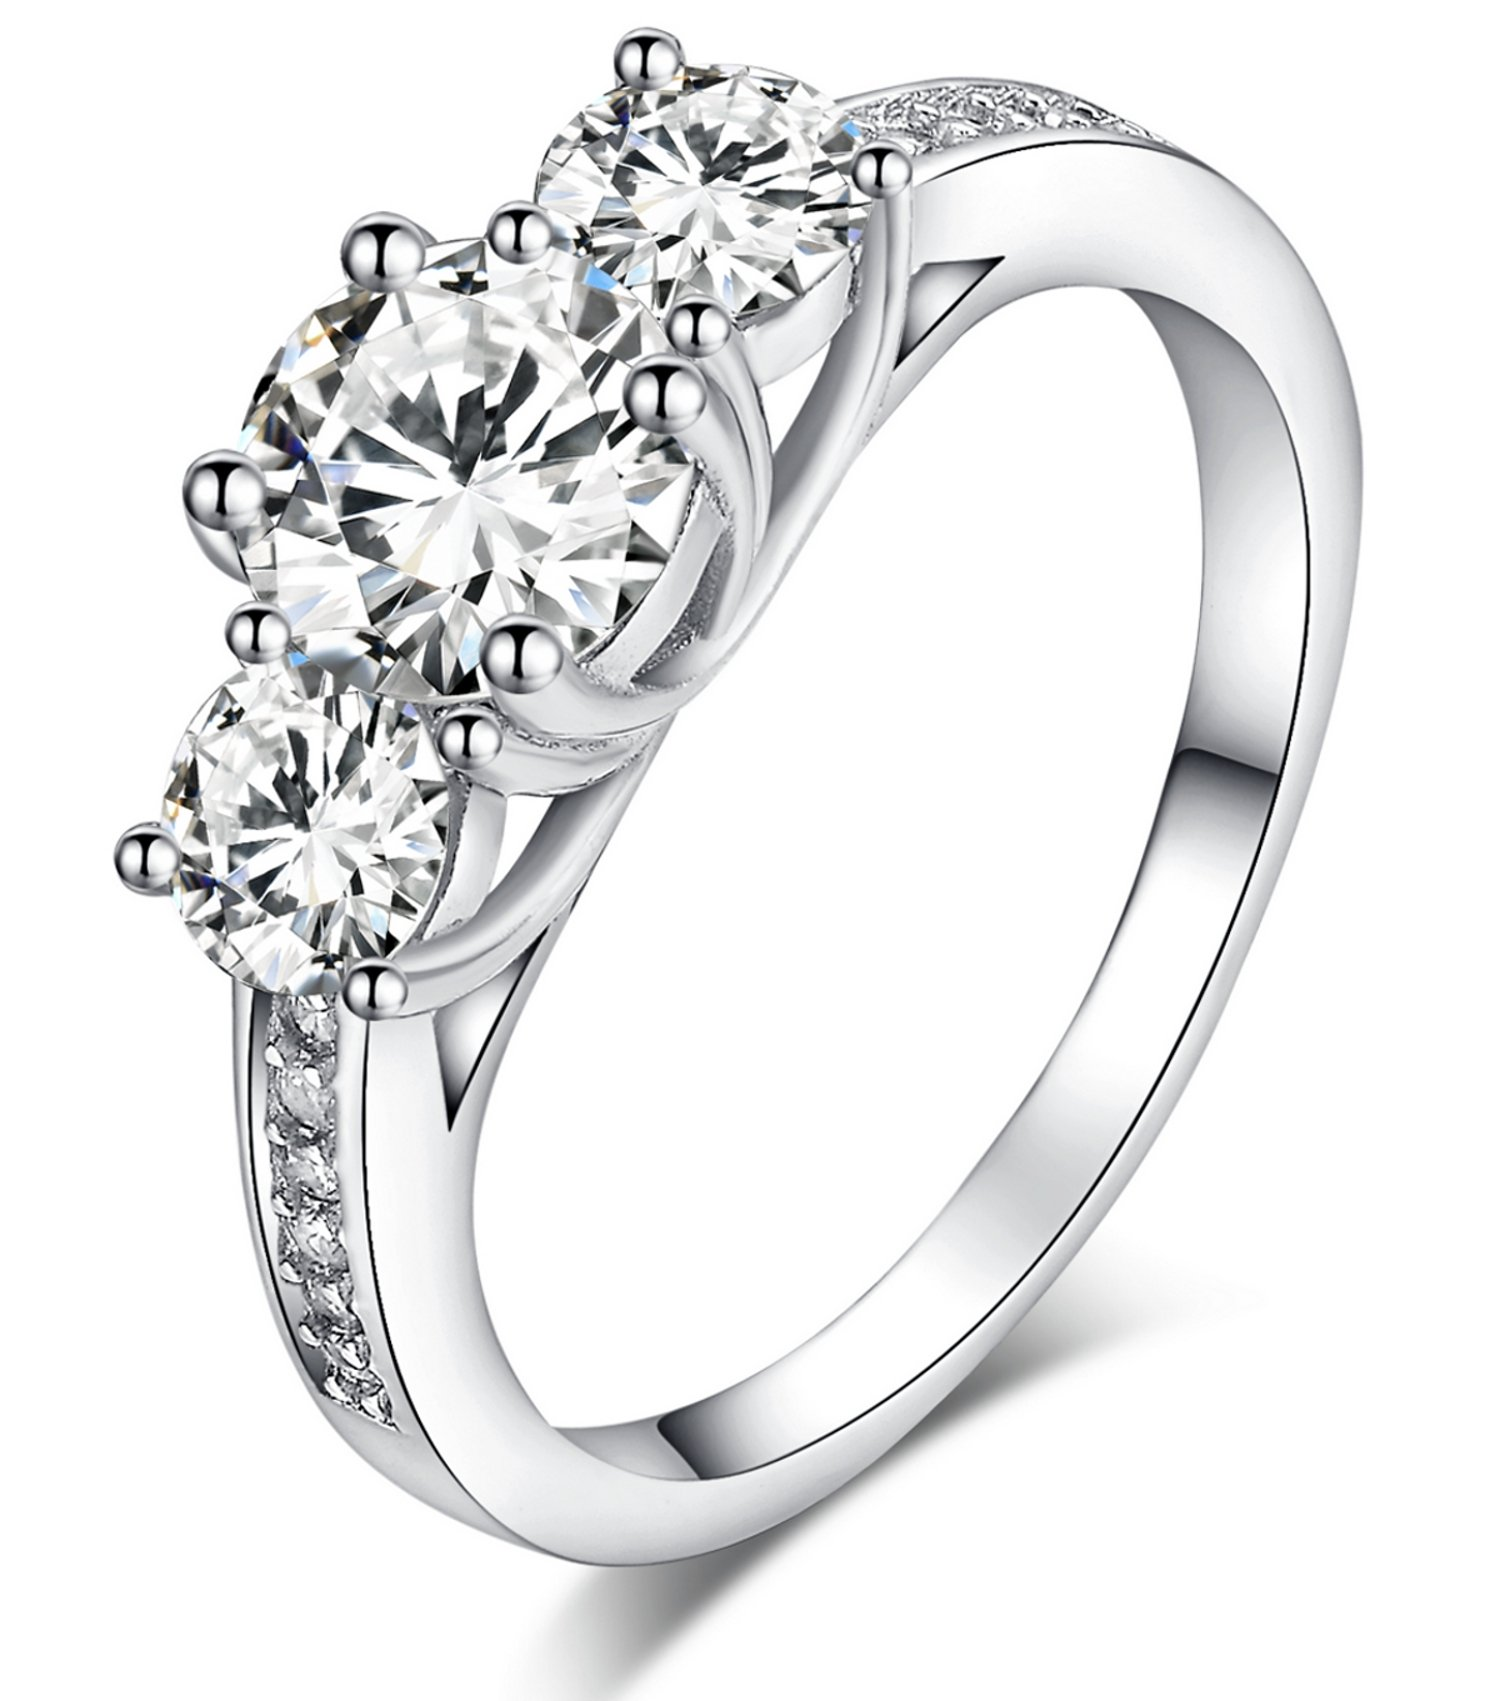 Sreema London 925 Sterling Silver Brilliant Round Cut Crystals Engagement/Wedding Ring (R)